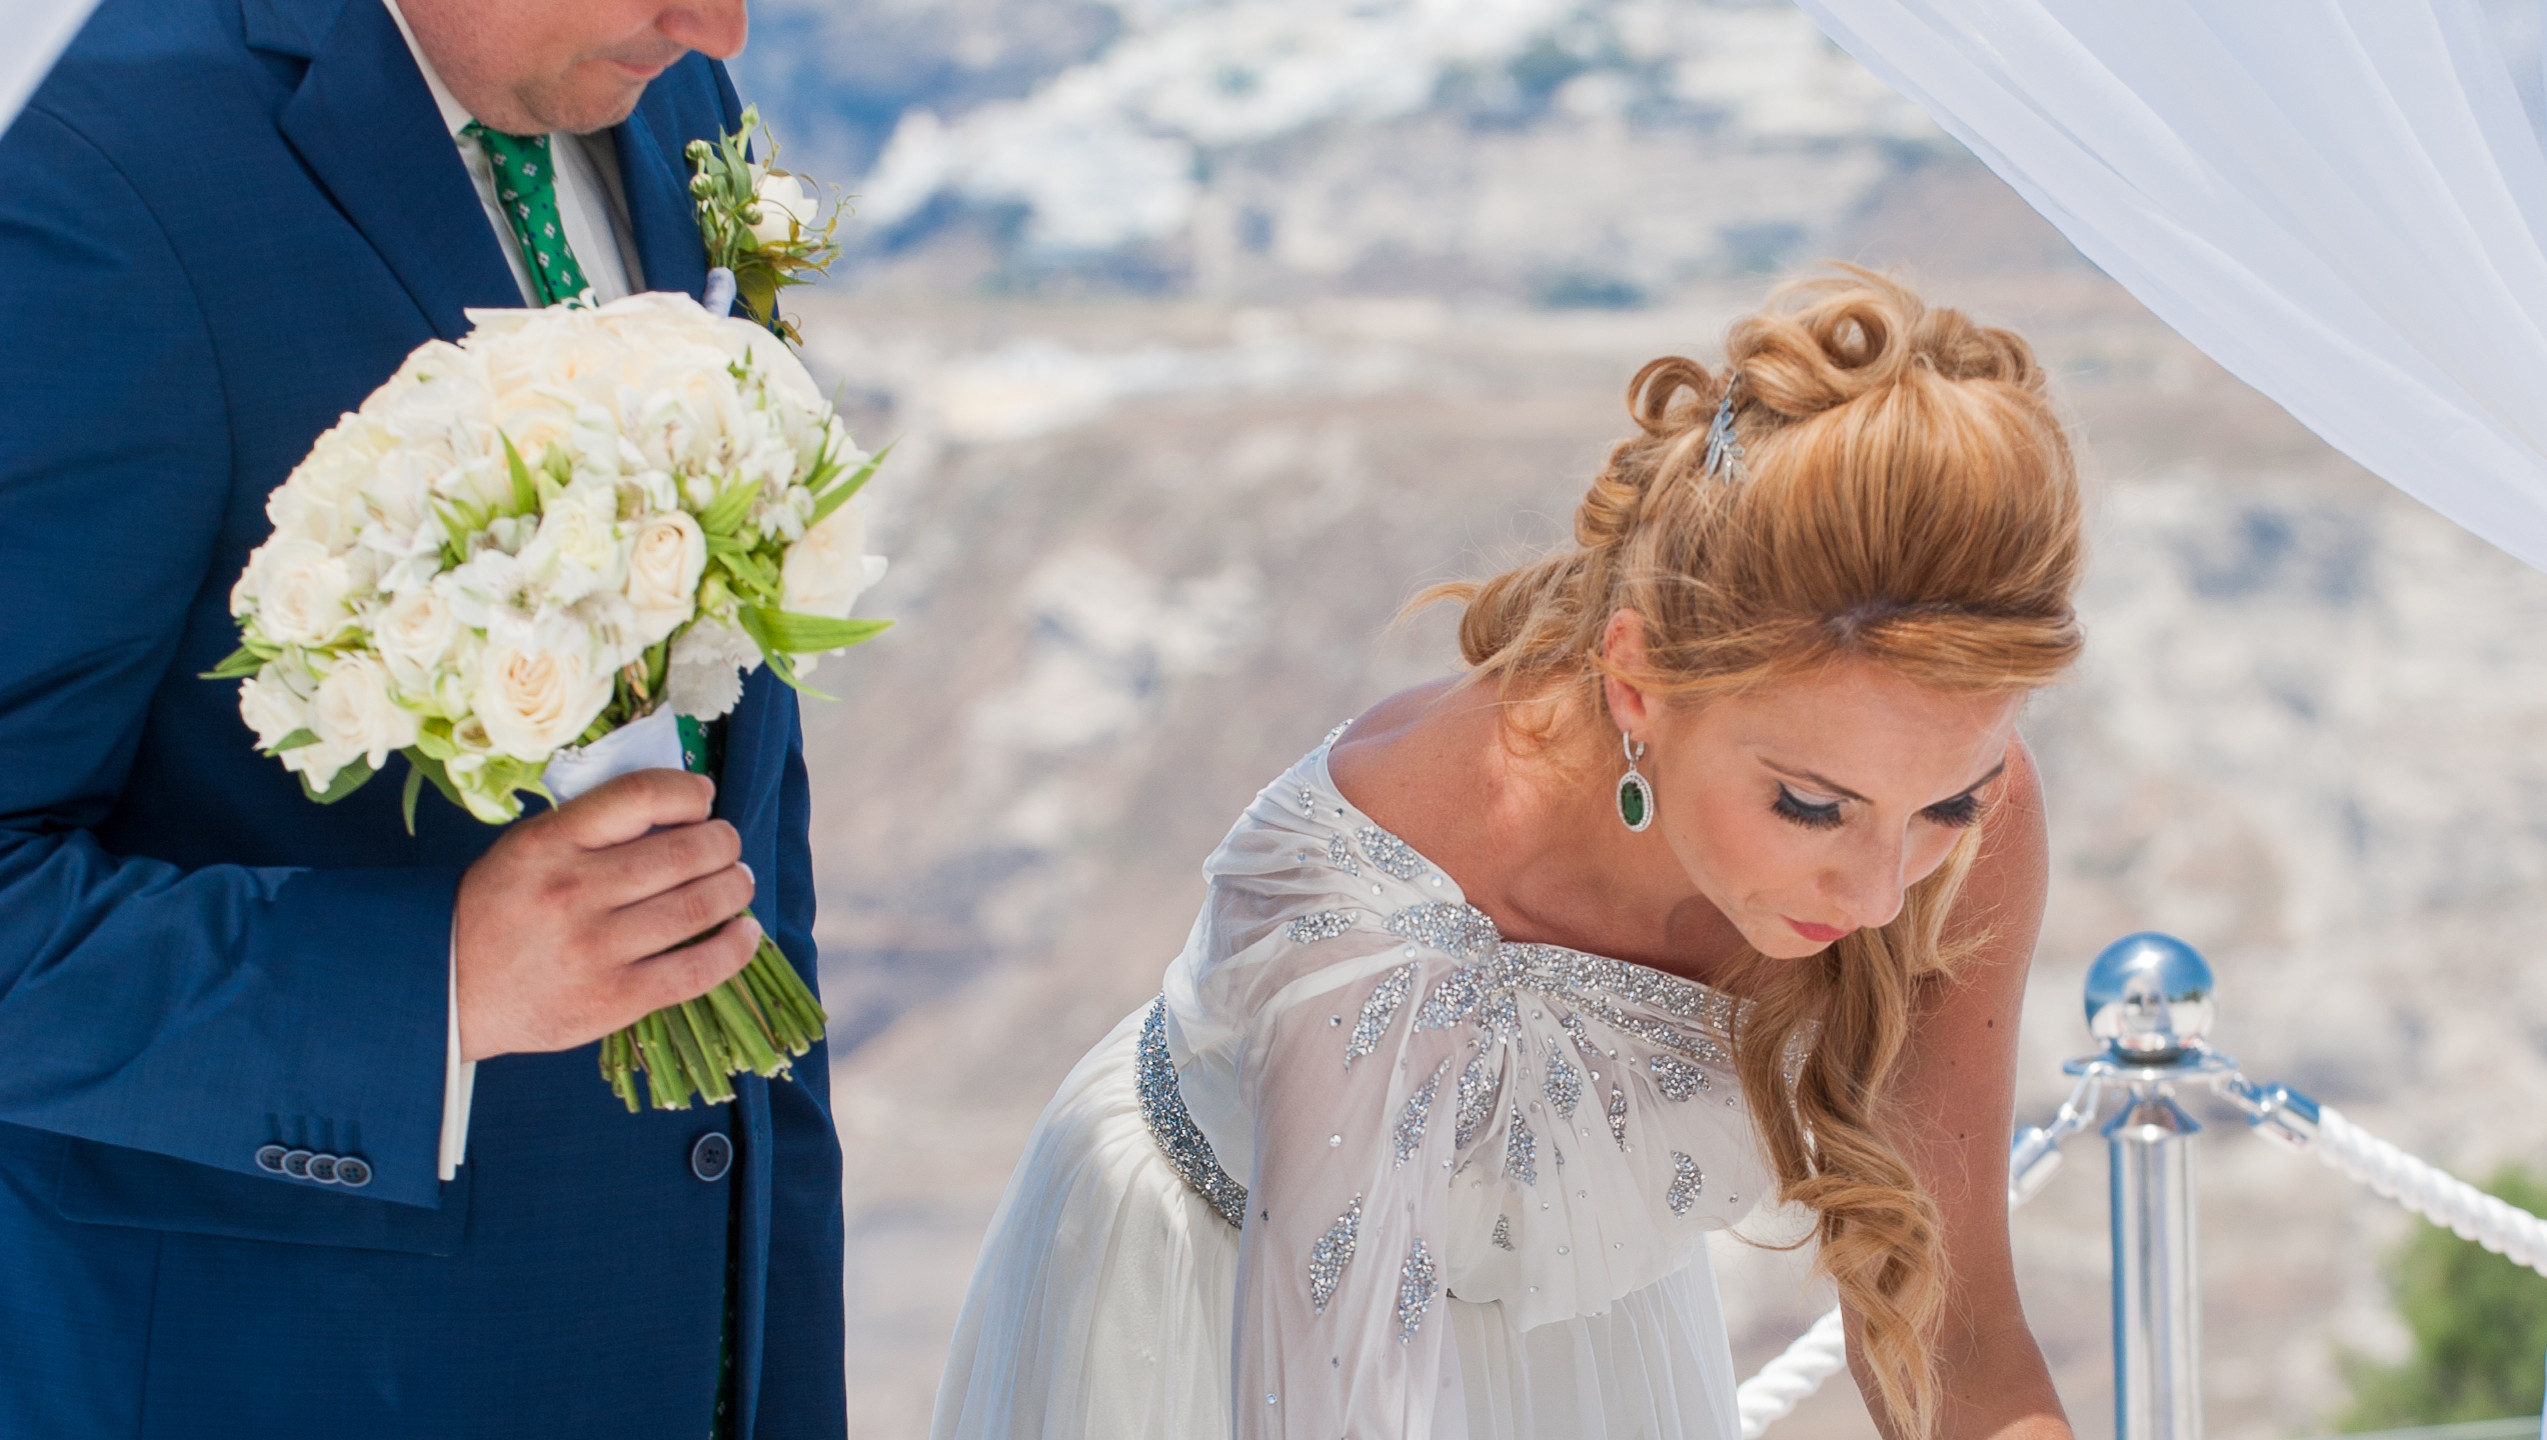 Mr & Mrs wedding in Greece